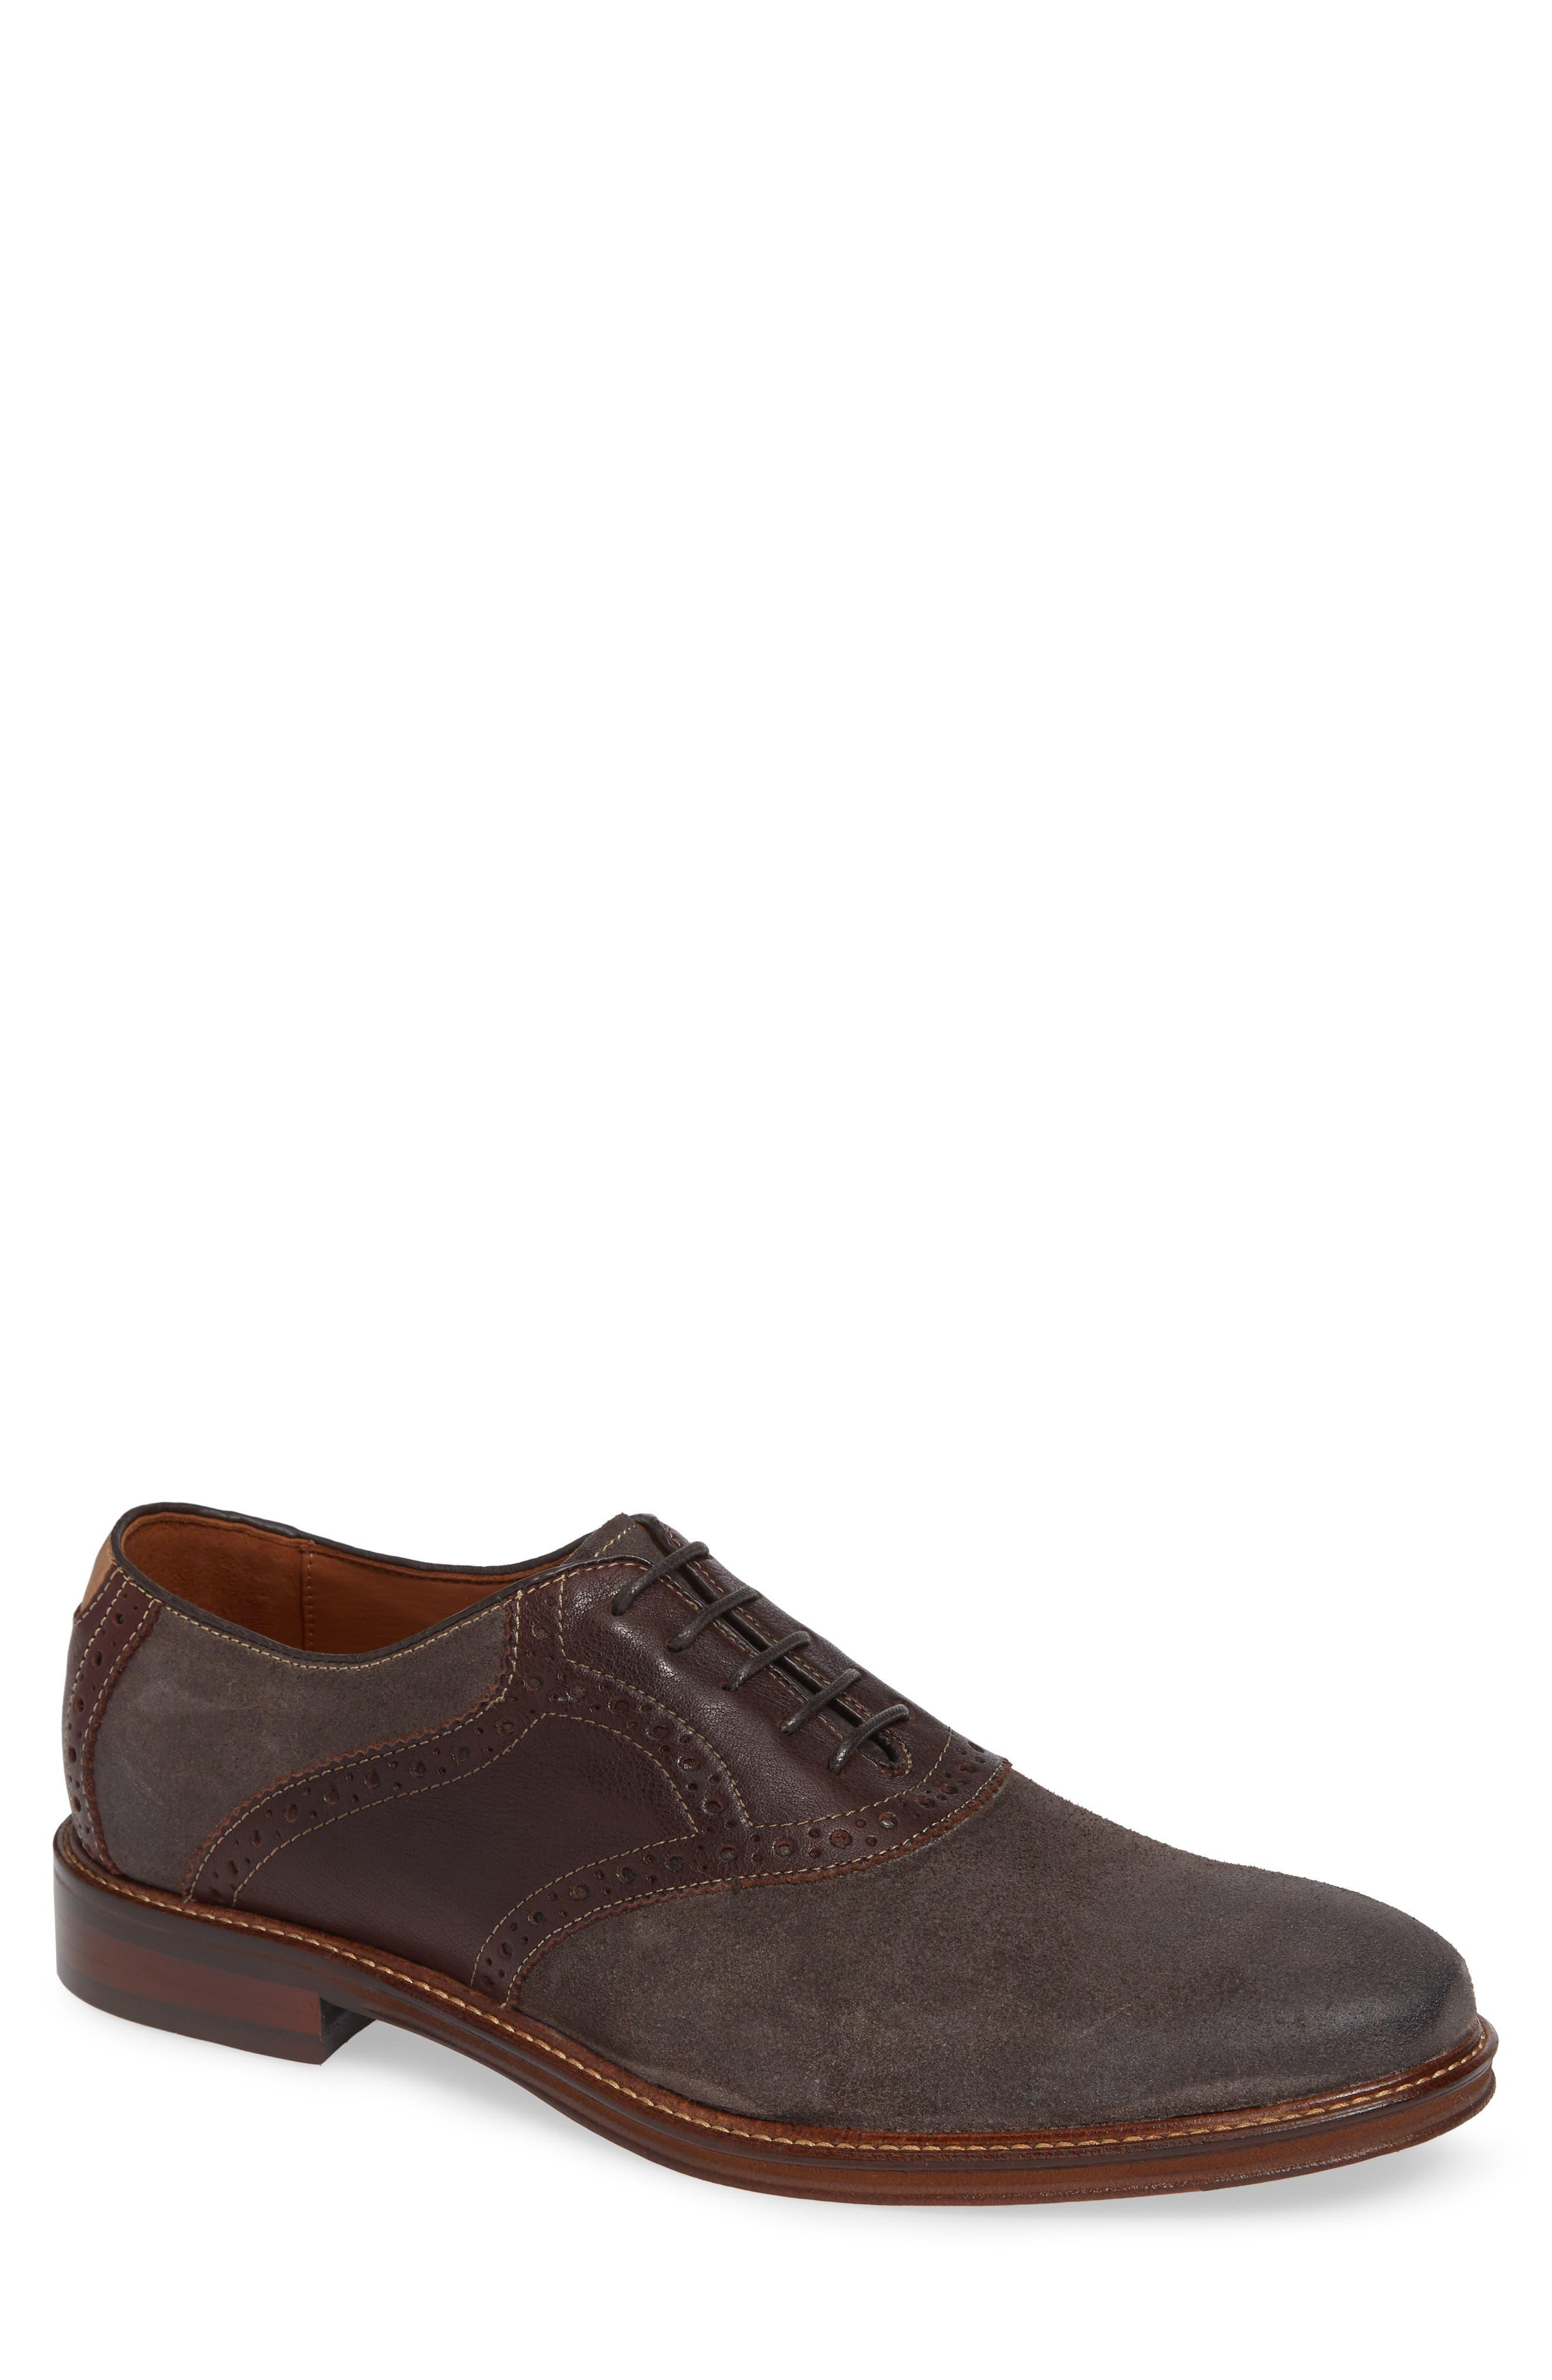 Warner Saddle Shoe,                             Main thumbnail 1, color,                             DARK GREY SUEDE